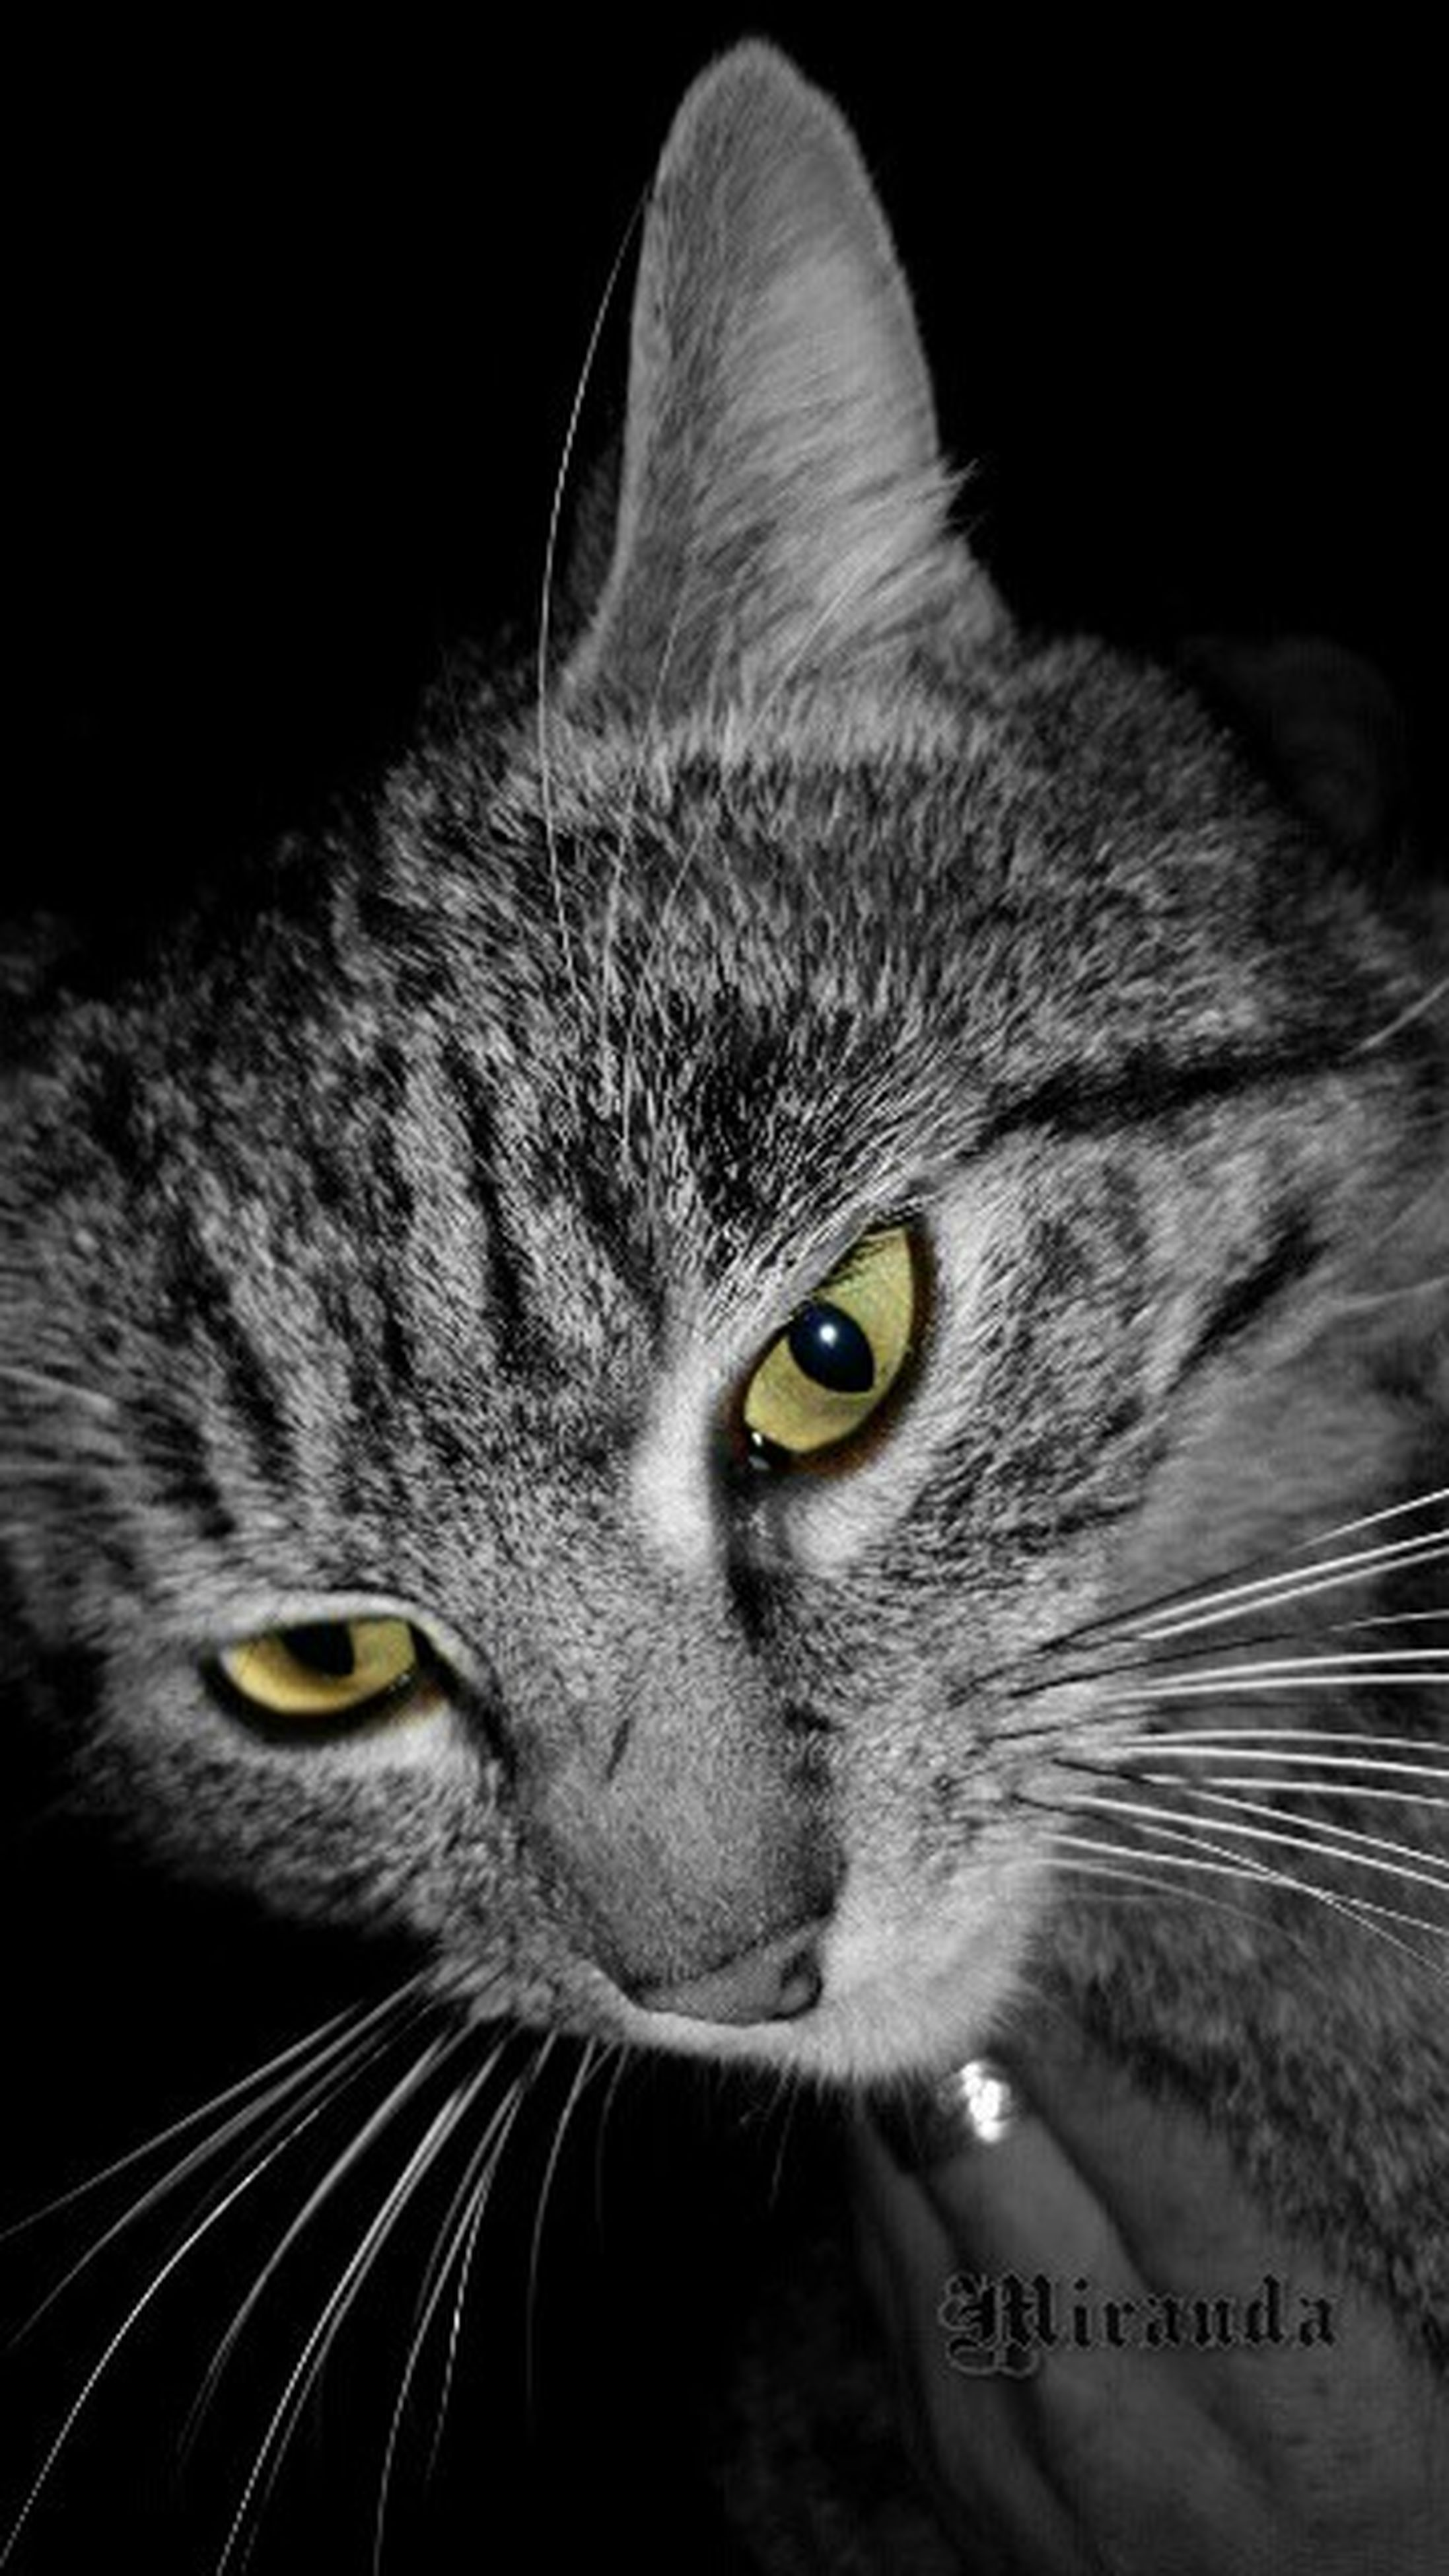 domestic cat, one animal, animal themes, cat, pets, domestic animals, feline, whisker, portrait, close-up, looking at camera, animal head, black background, animal eye, mammal, studio shot, indoors, staring, animal body part, alertness